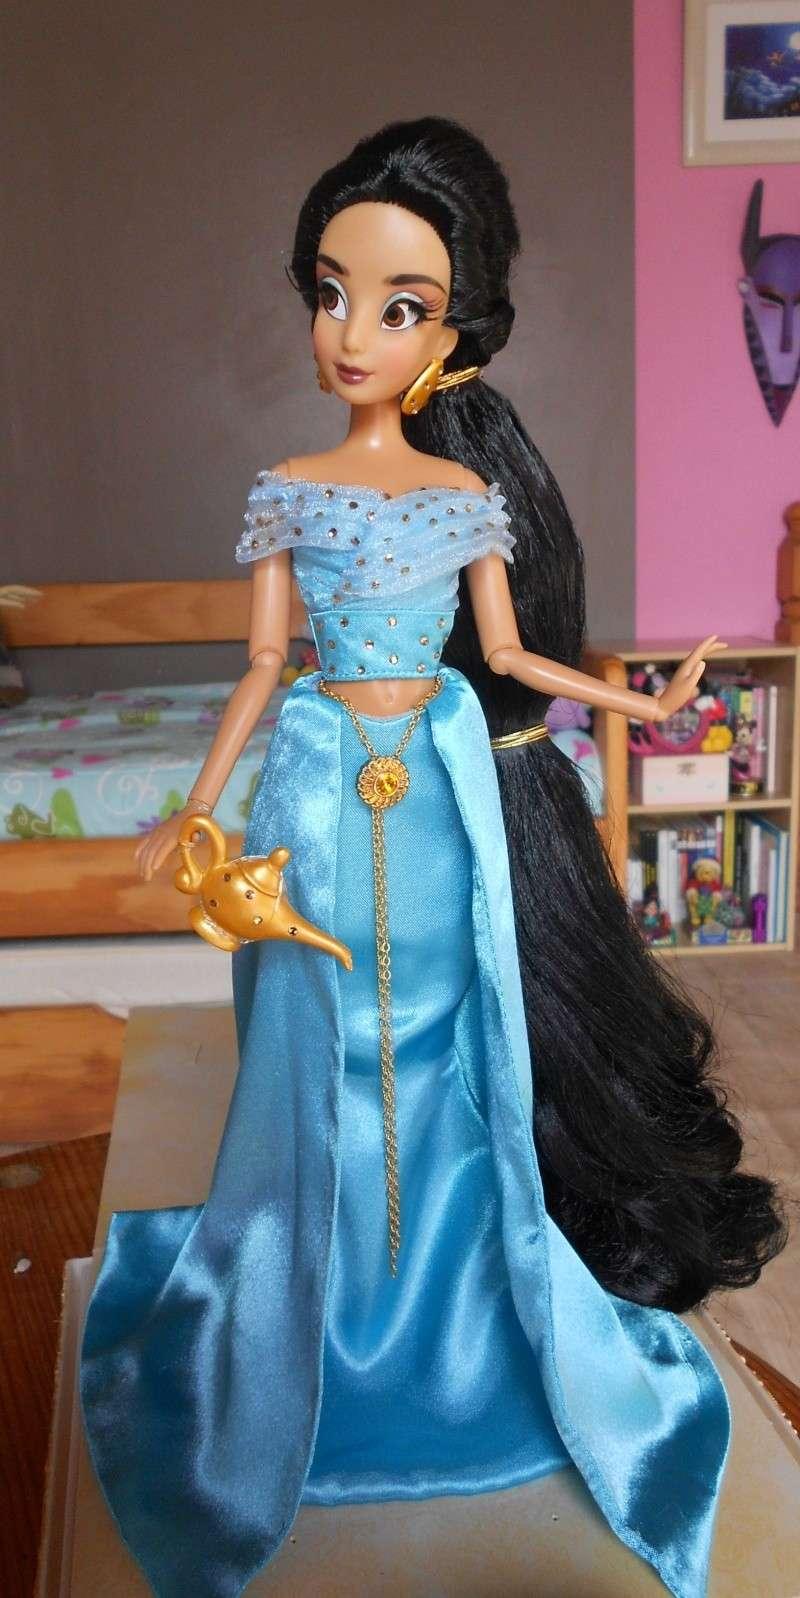 Disney Princess Designer Collection (depuis 2011) - Page 5 Dscn4214